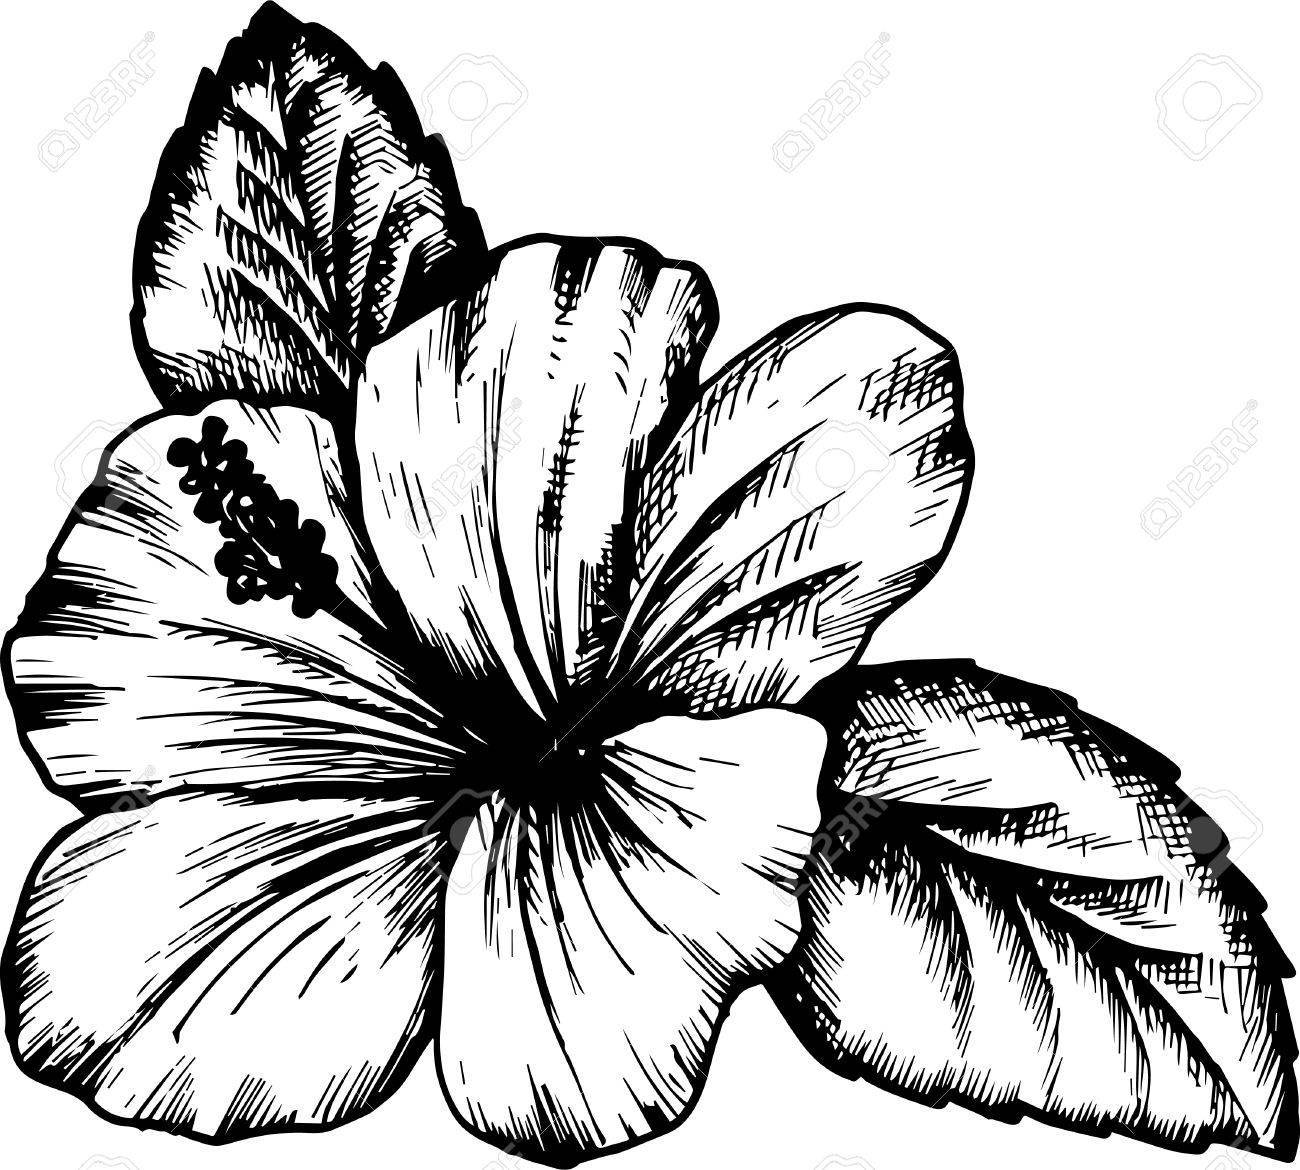 Hibiscus flower hand drawn vintage vector illustration royalty free hibiscus flower hand drawn vintage vector illustration stock vector 51909068 izmirmasajfo